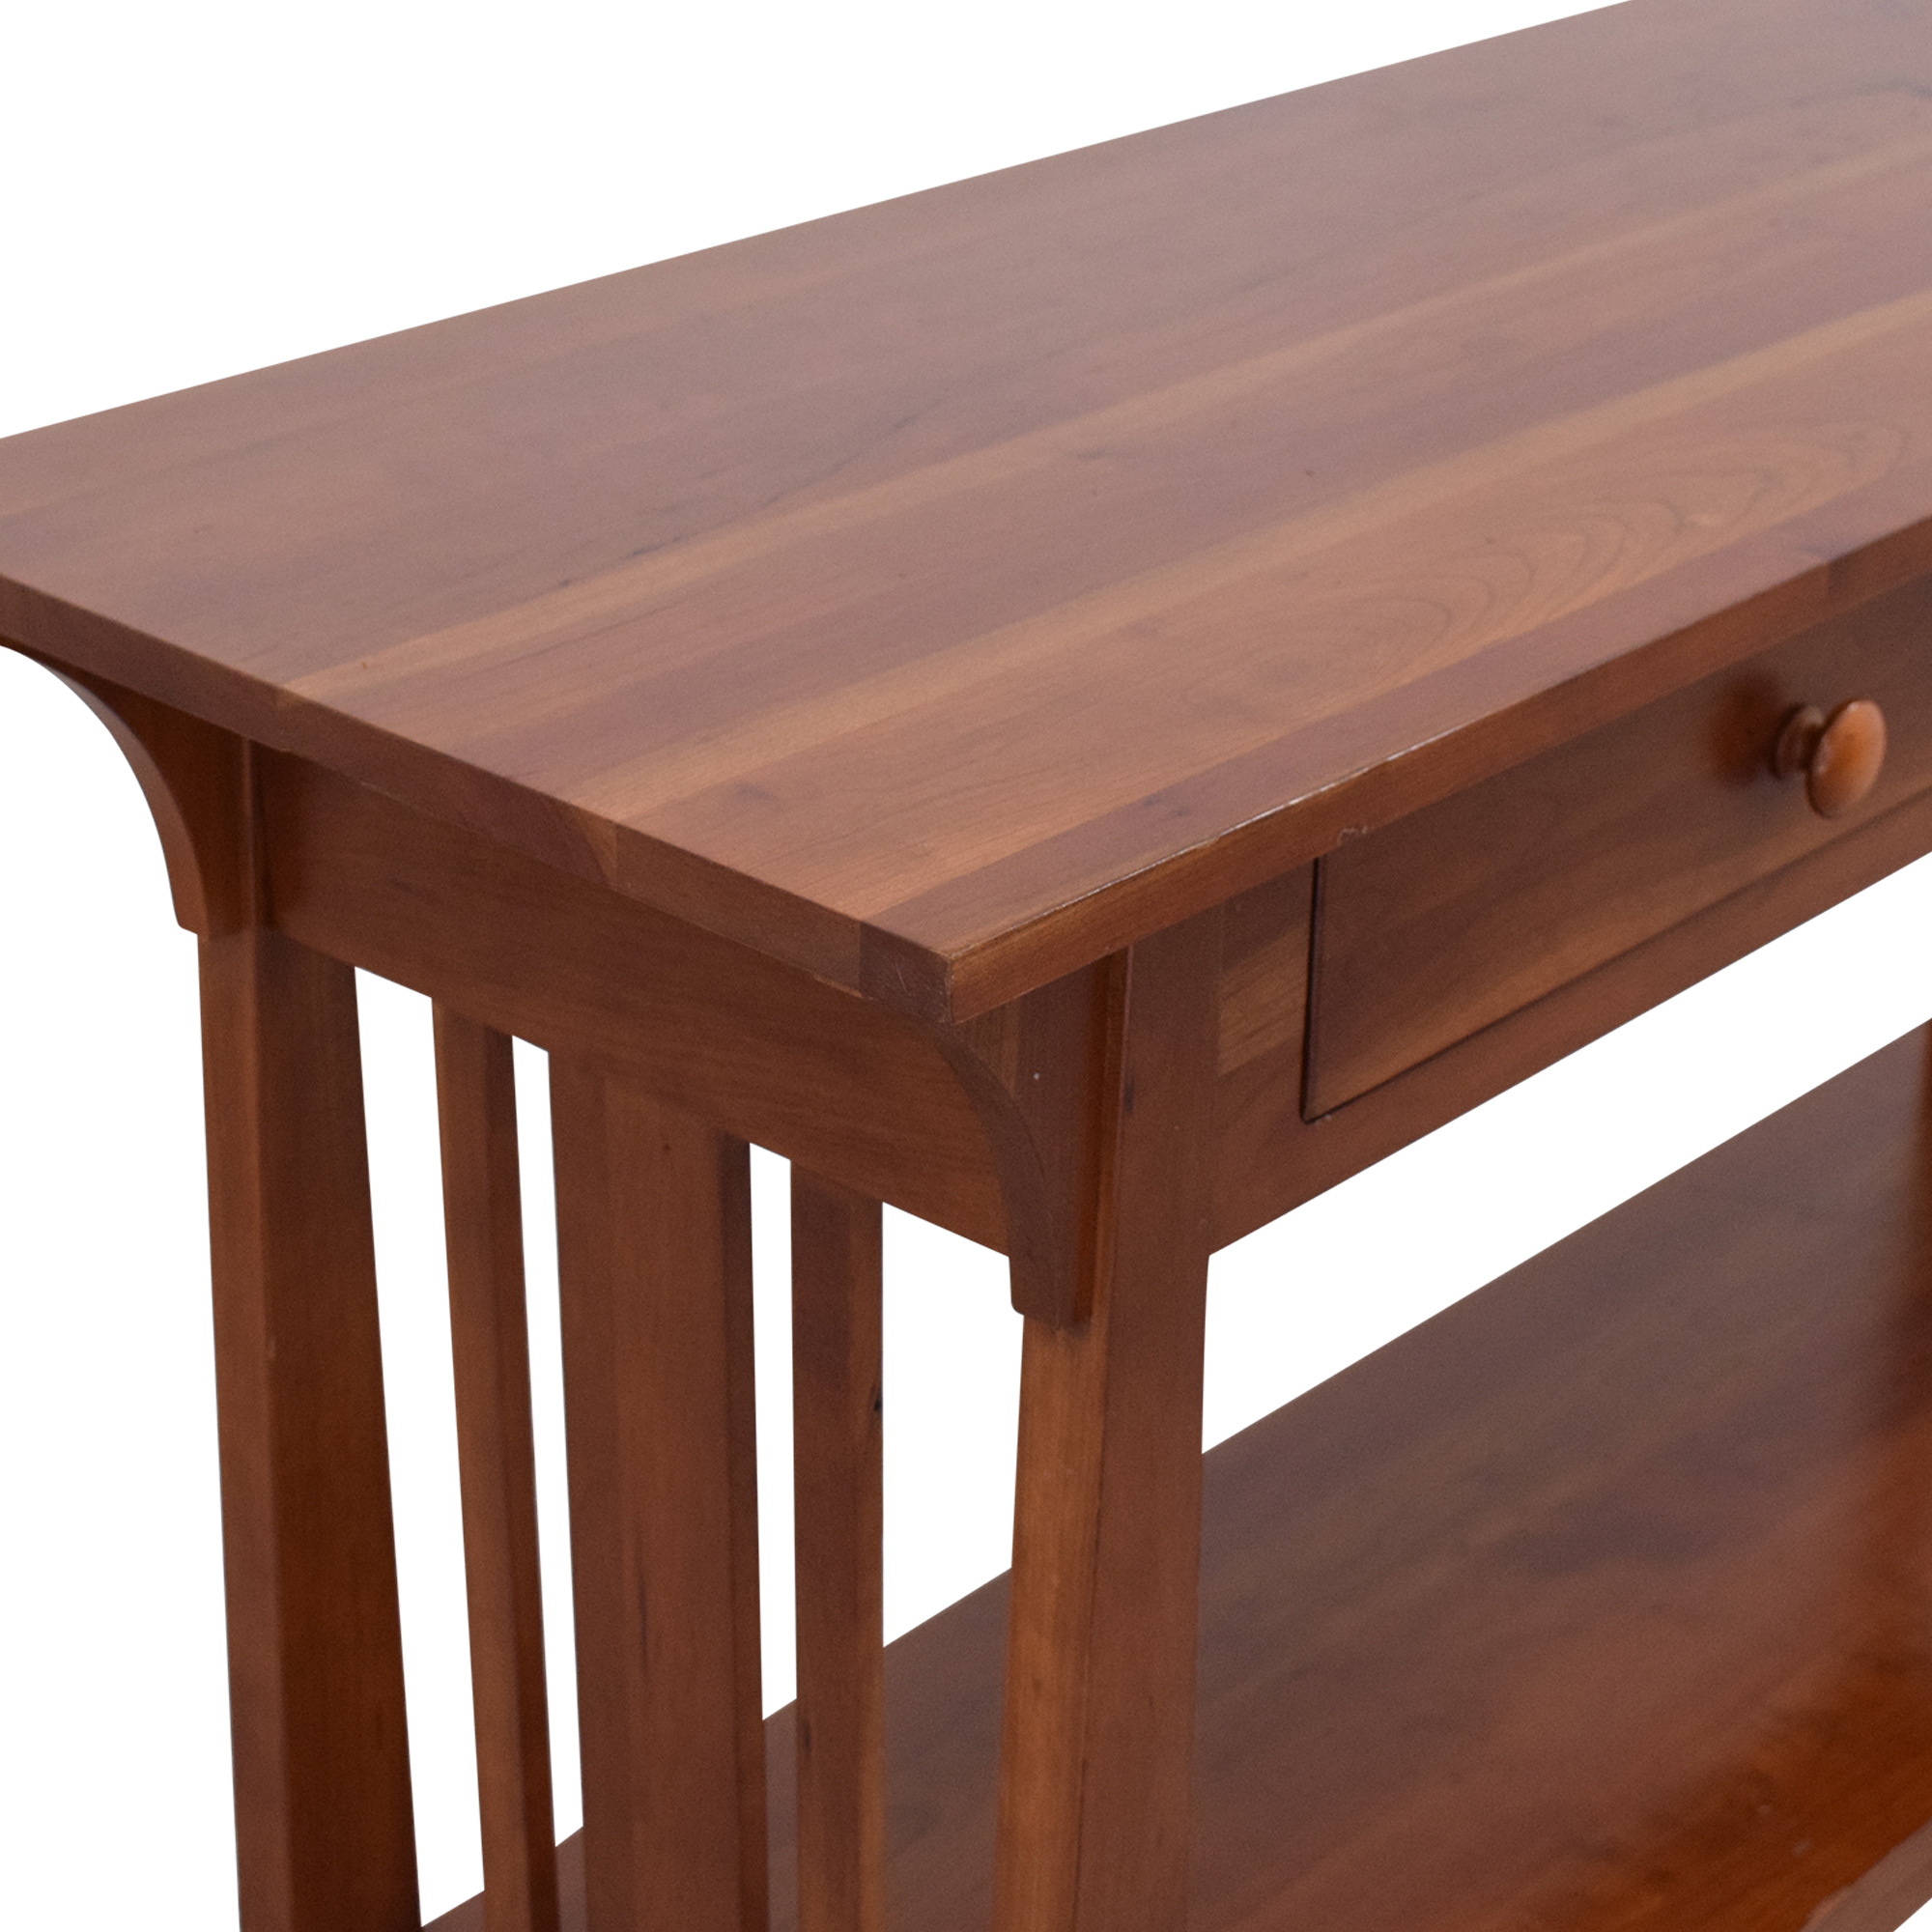 Ethan Allen Ethan Allen Peter Sofa Table Accent Tables